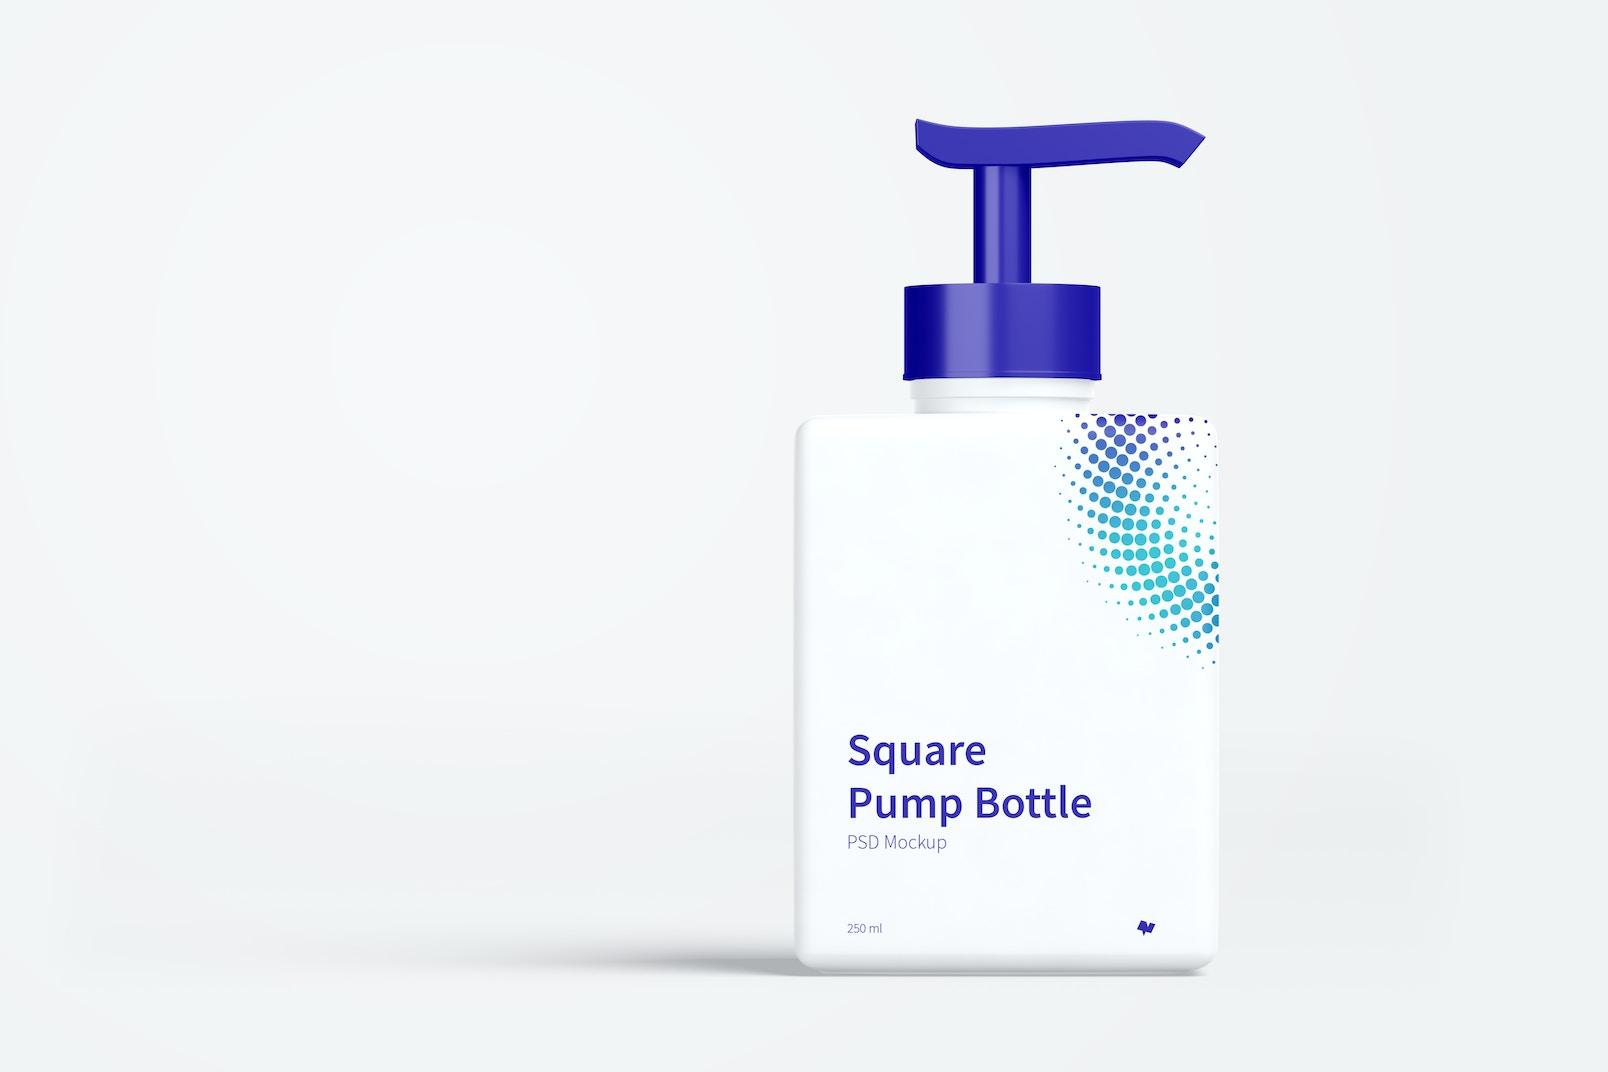 250 ml Square Pump Bottle Mockup, Front View 03